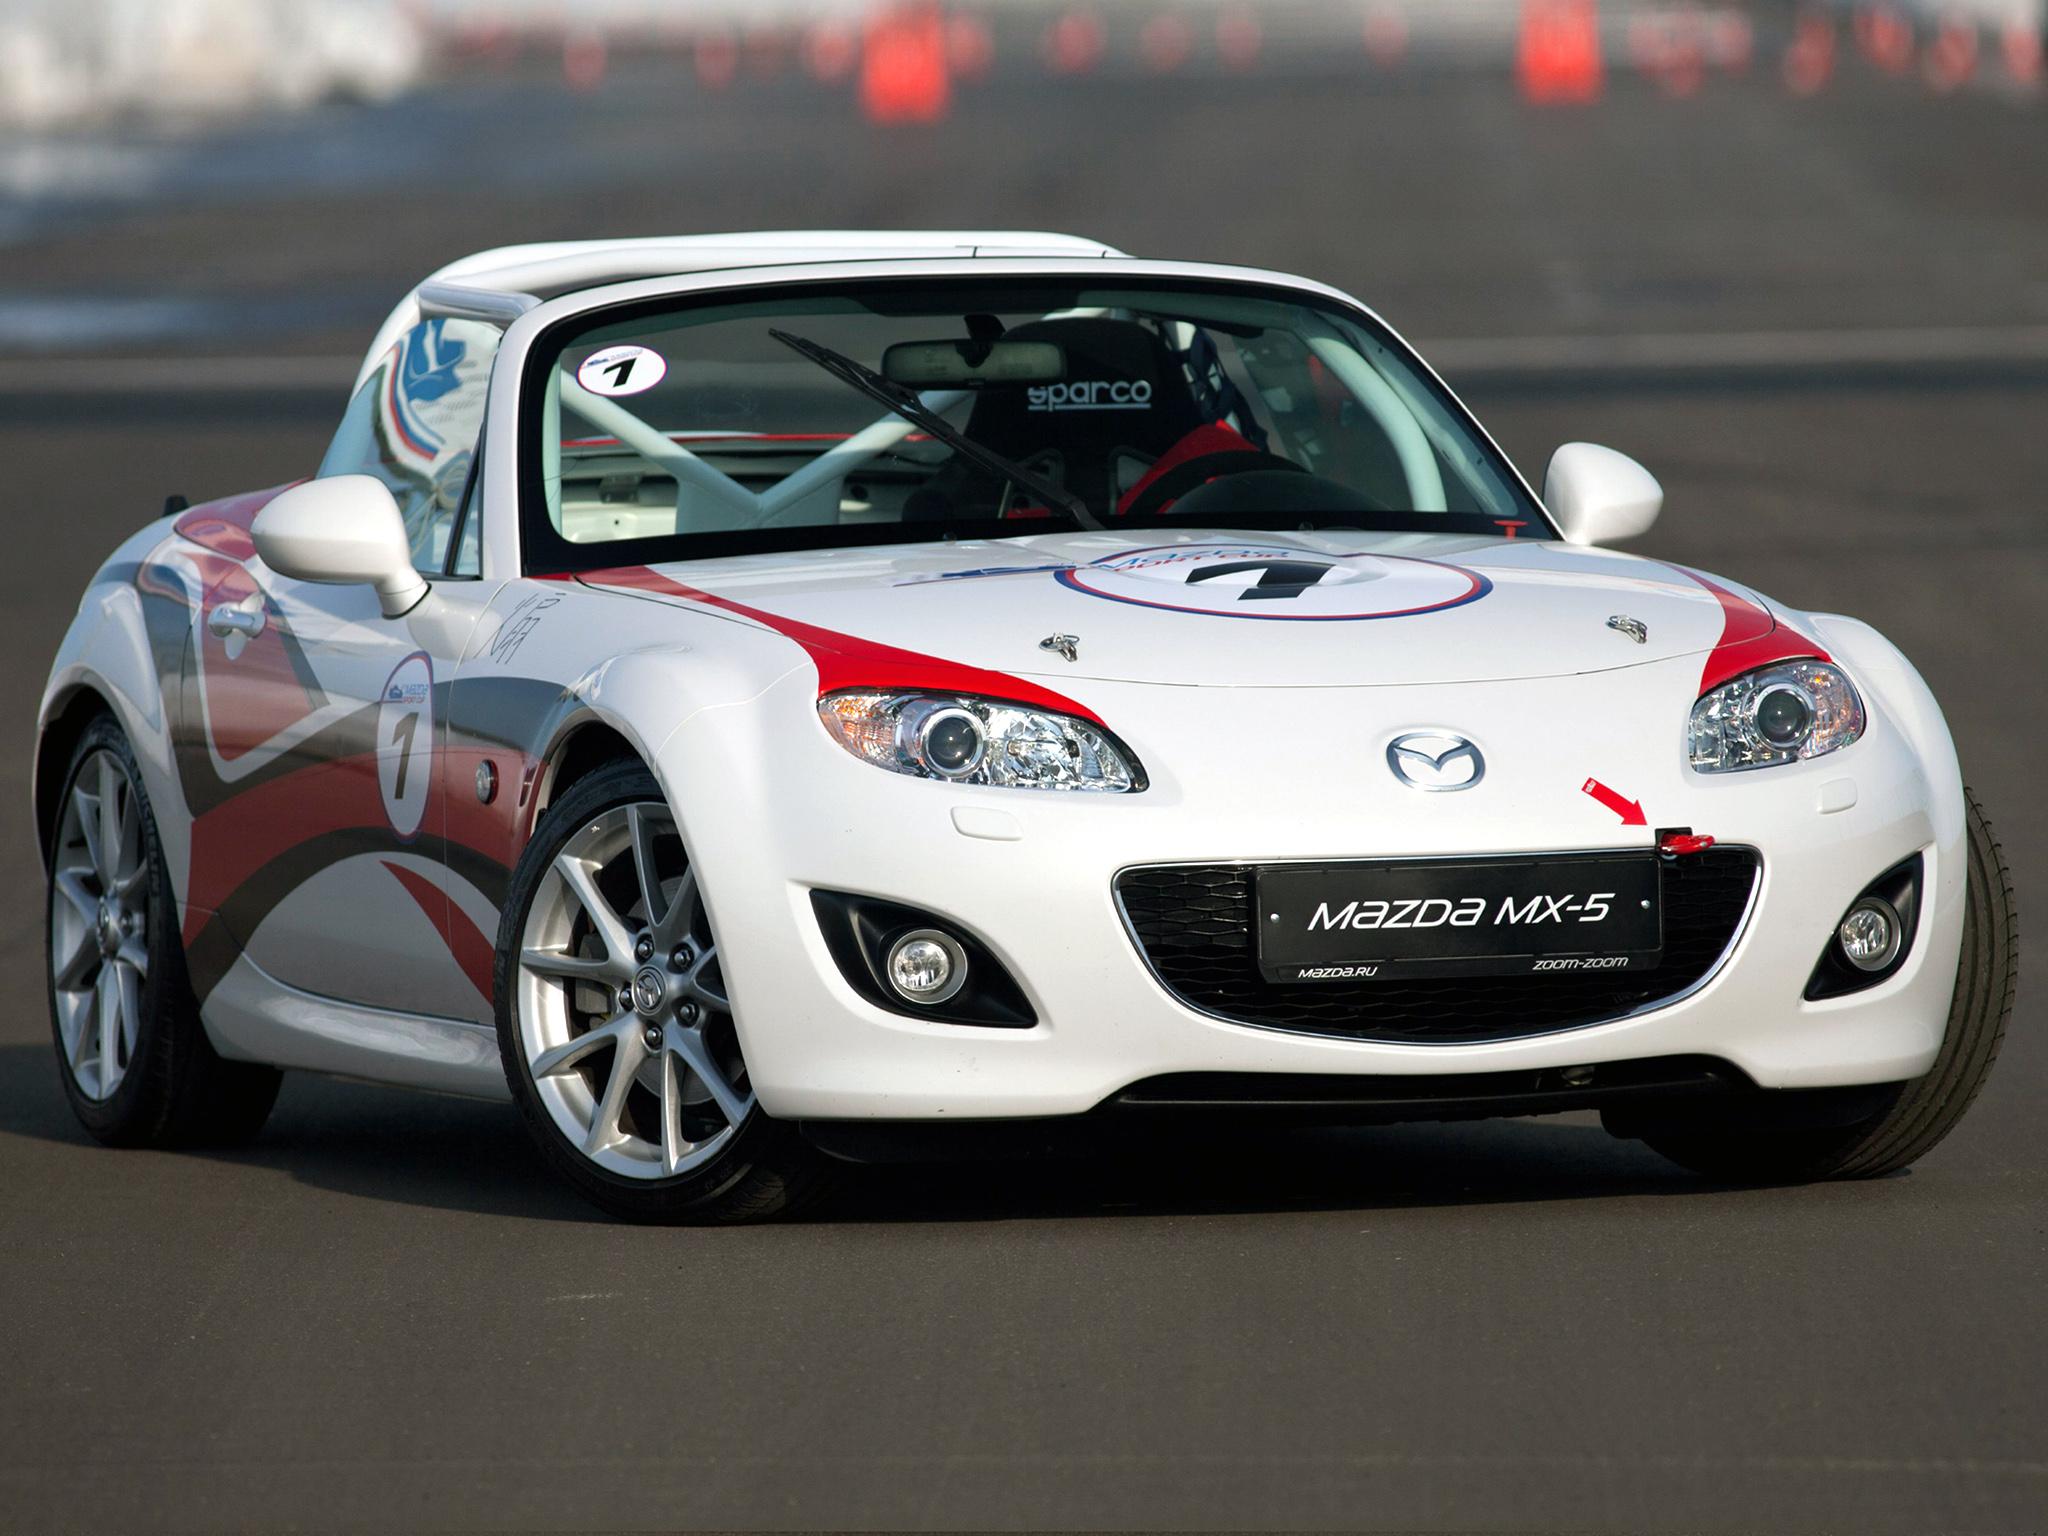 Mazda MX-5 G-T NC2 - 2048x1536